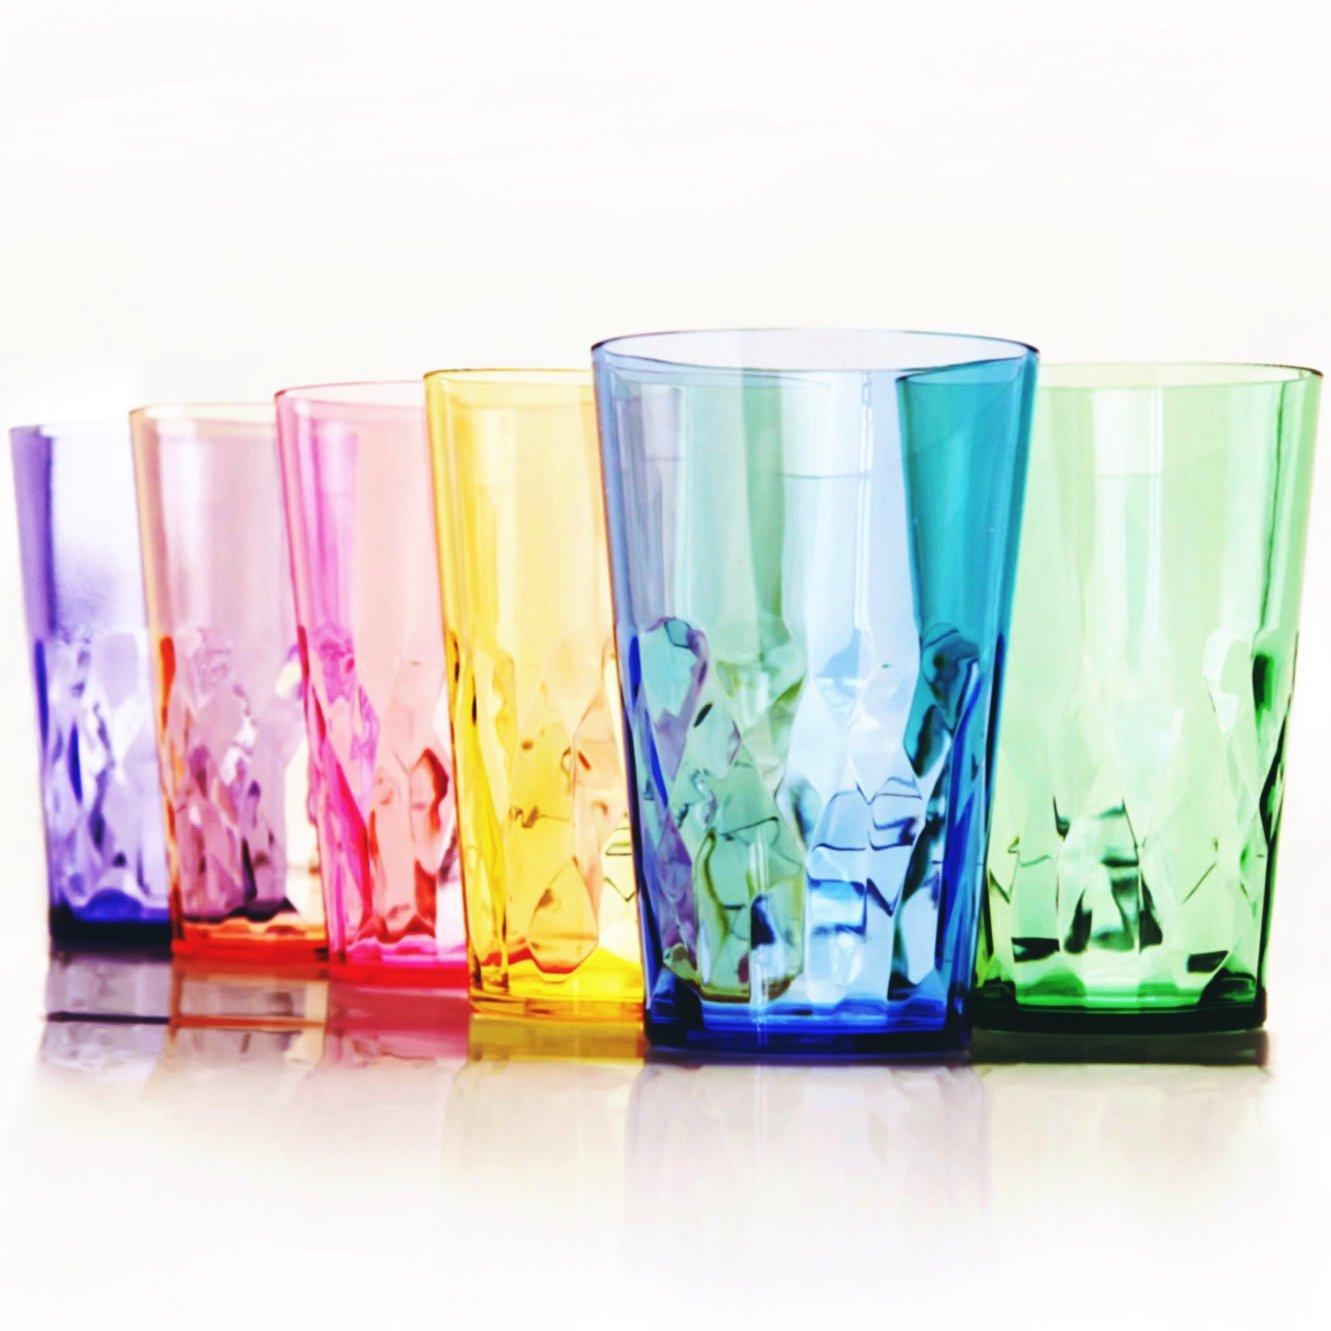 19 oz Premium Drinking Glasses - Set of 6 - Unbreakable Tritan Plastic - BPA Free - 100% Made in Japan (Assorted Colors)